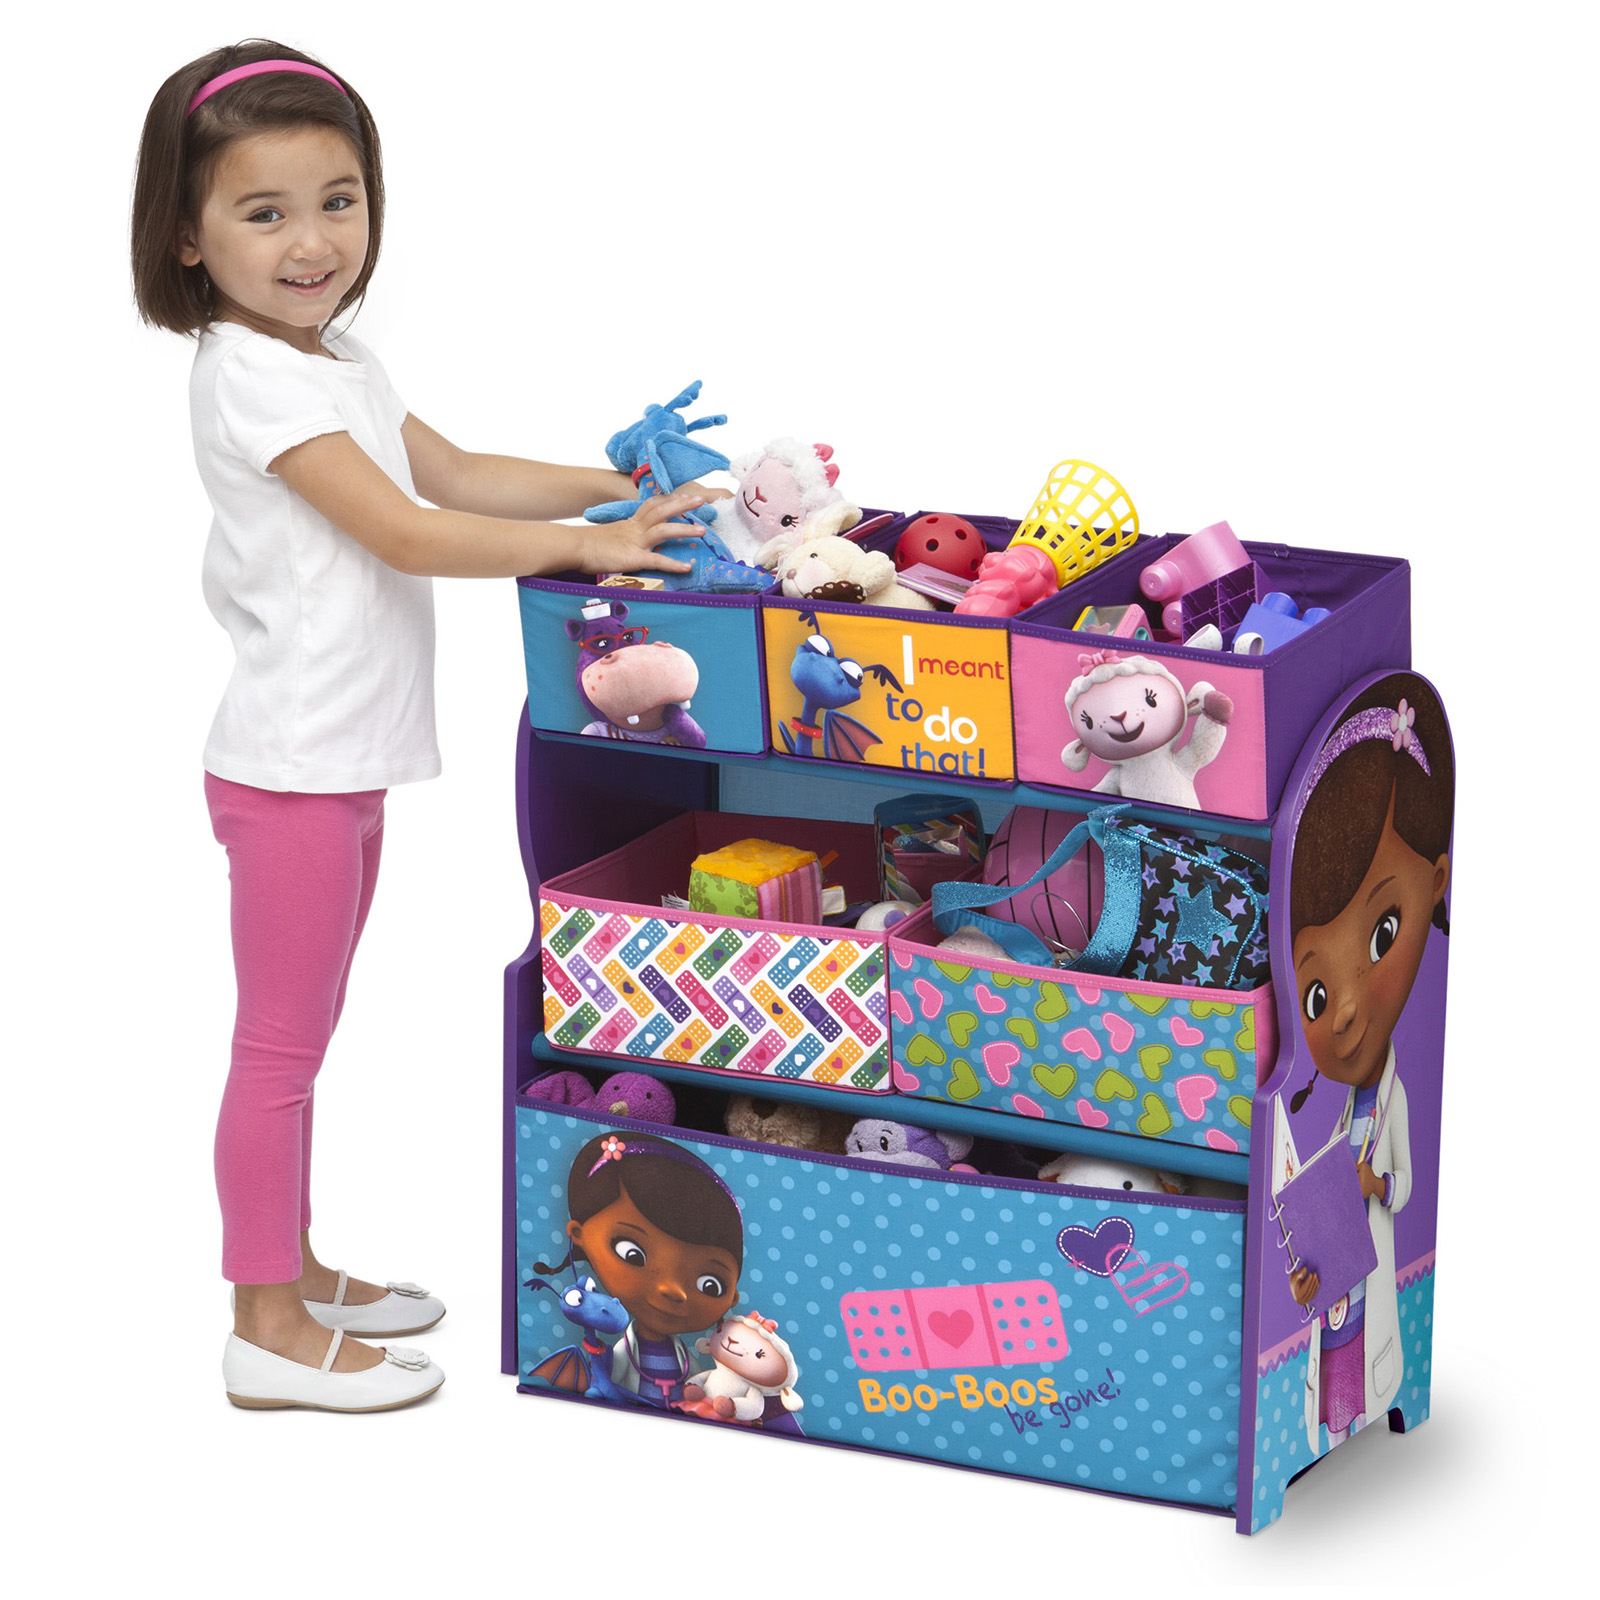 doc mcstuffins upholstered chair uk cover rentals langley delta children disney wooden multi bin toy